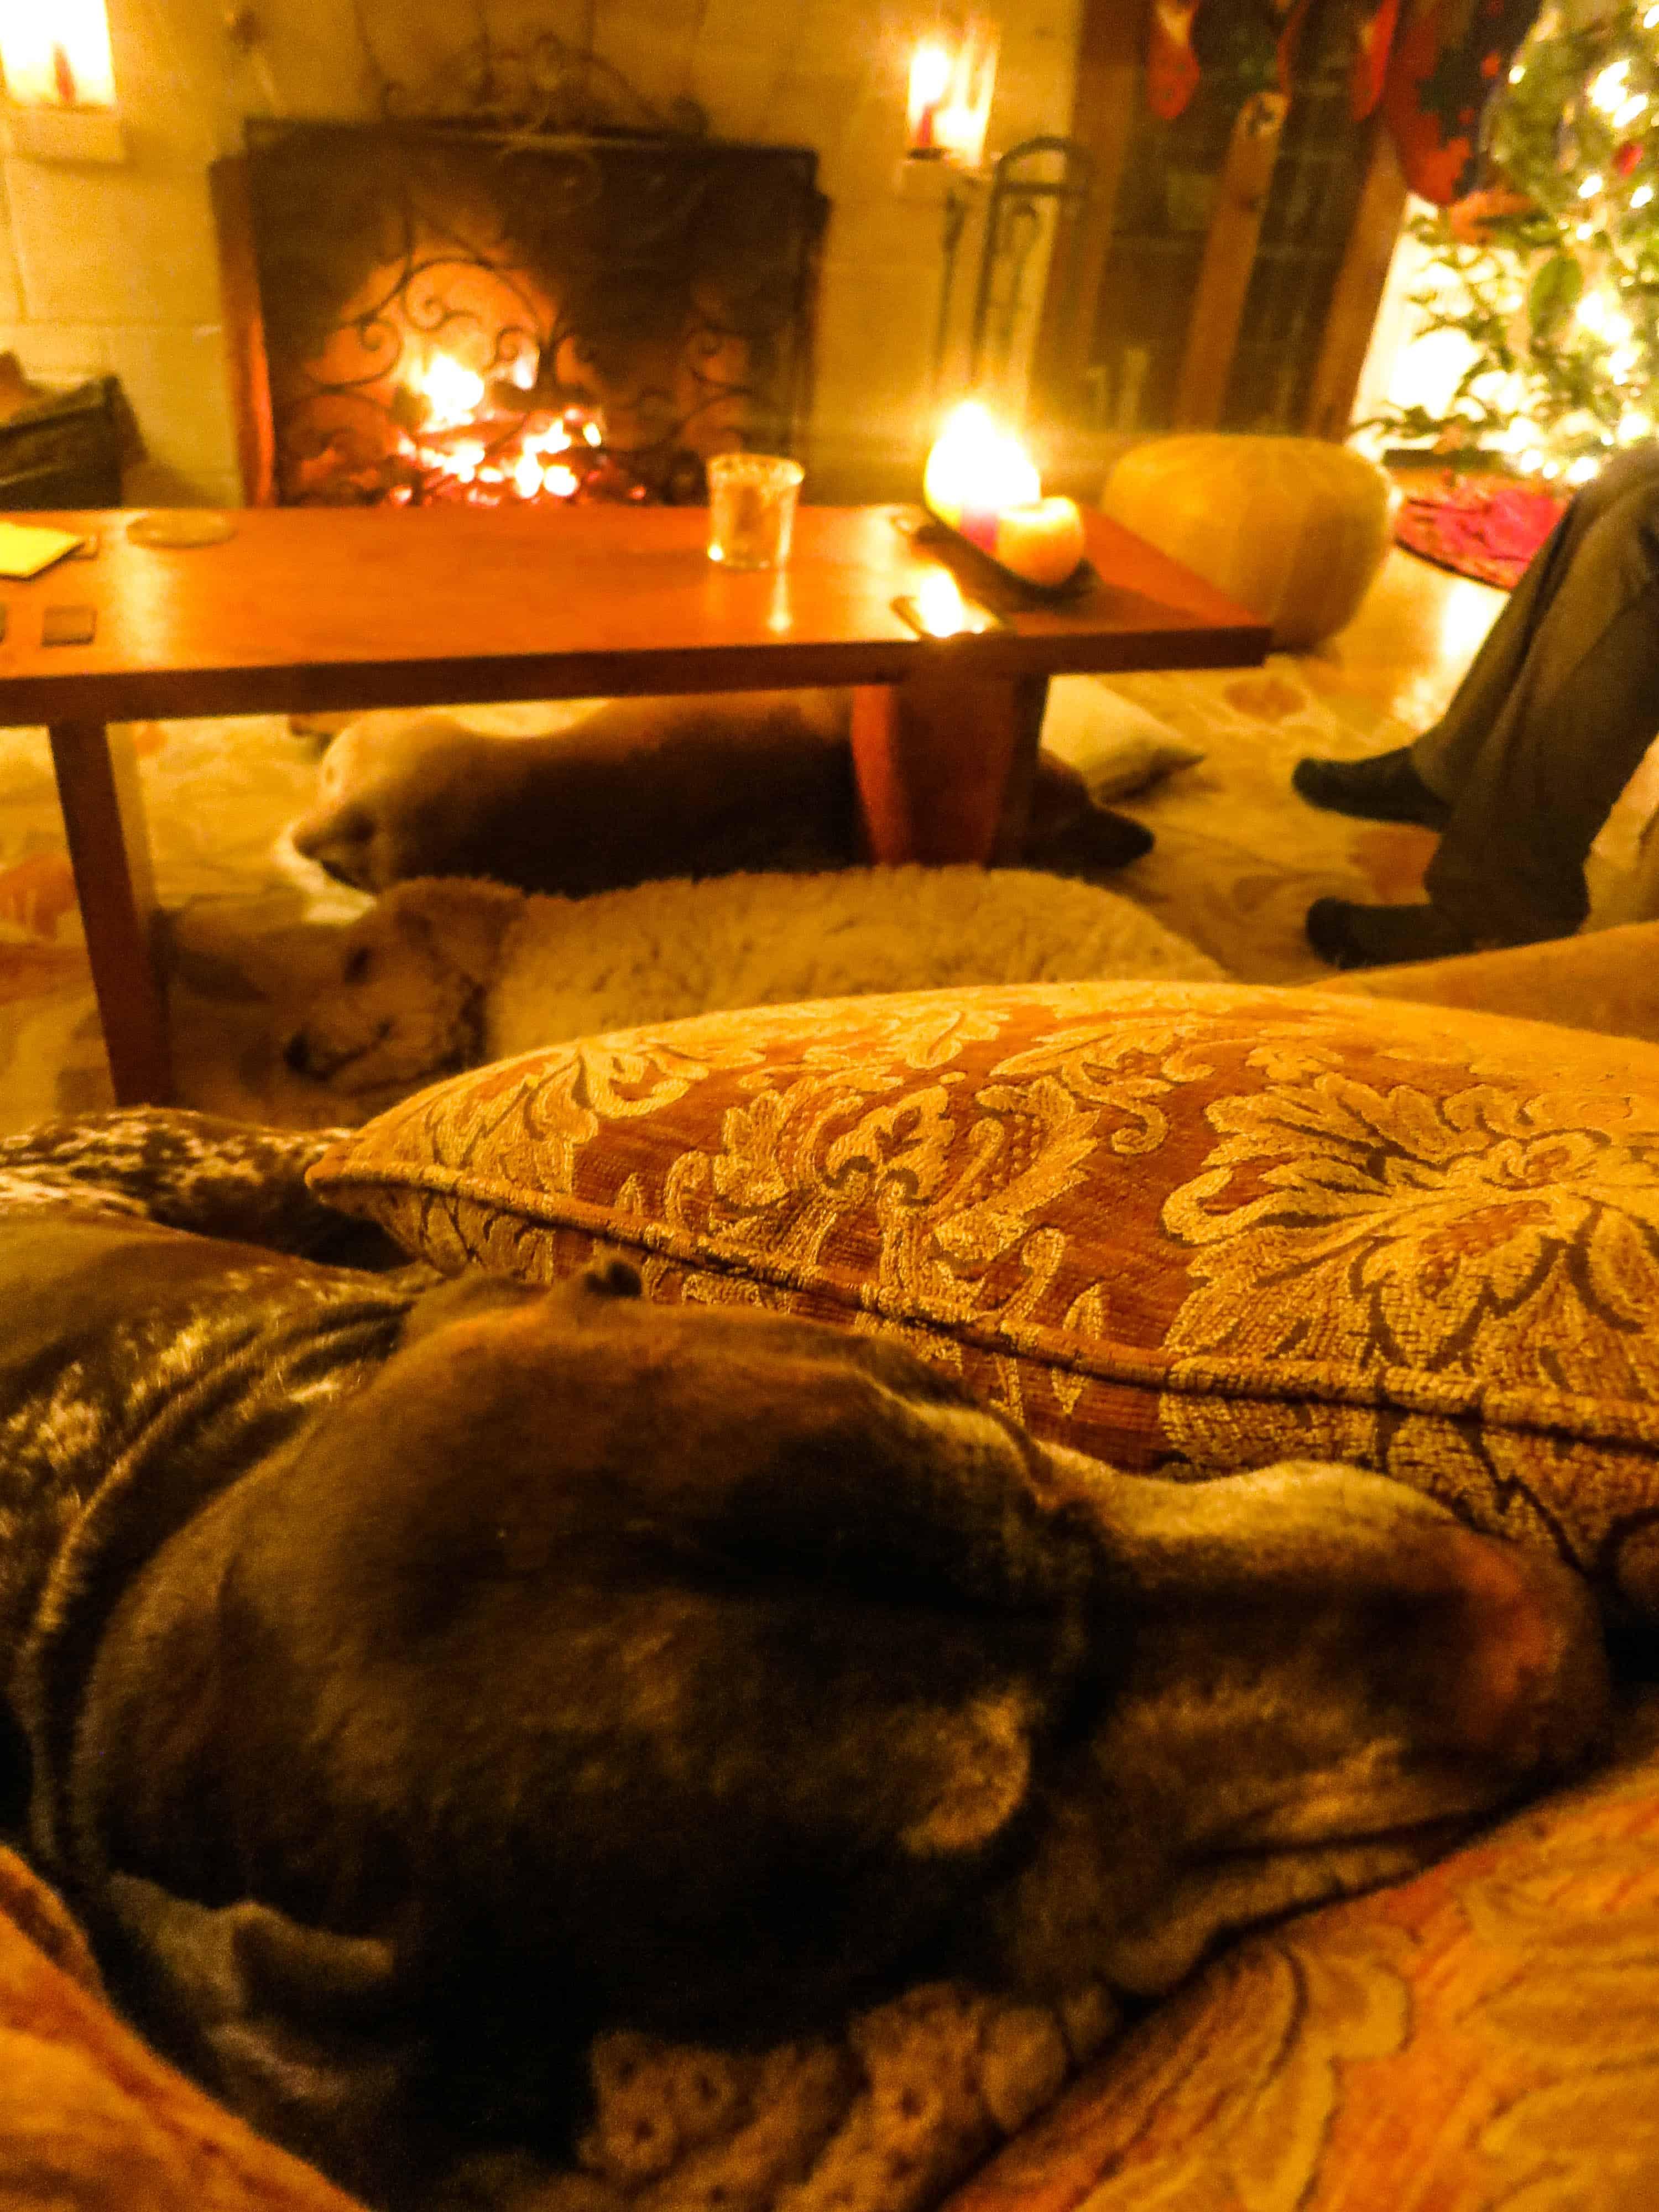 Pet blog, dog blog